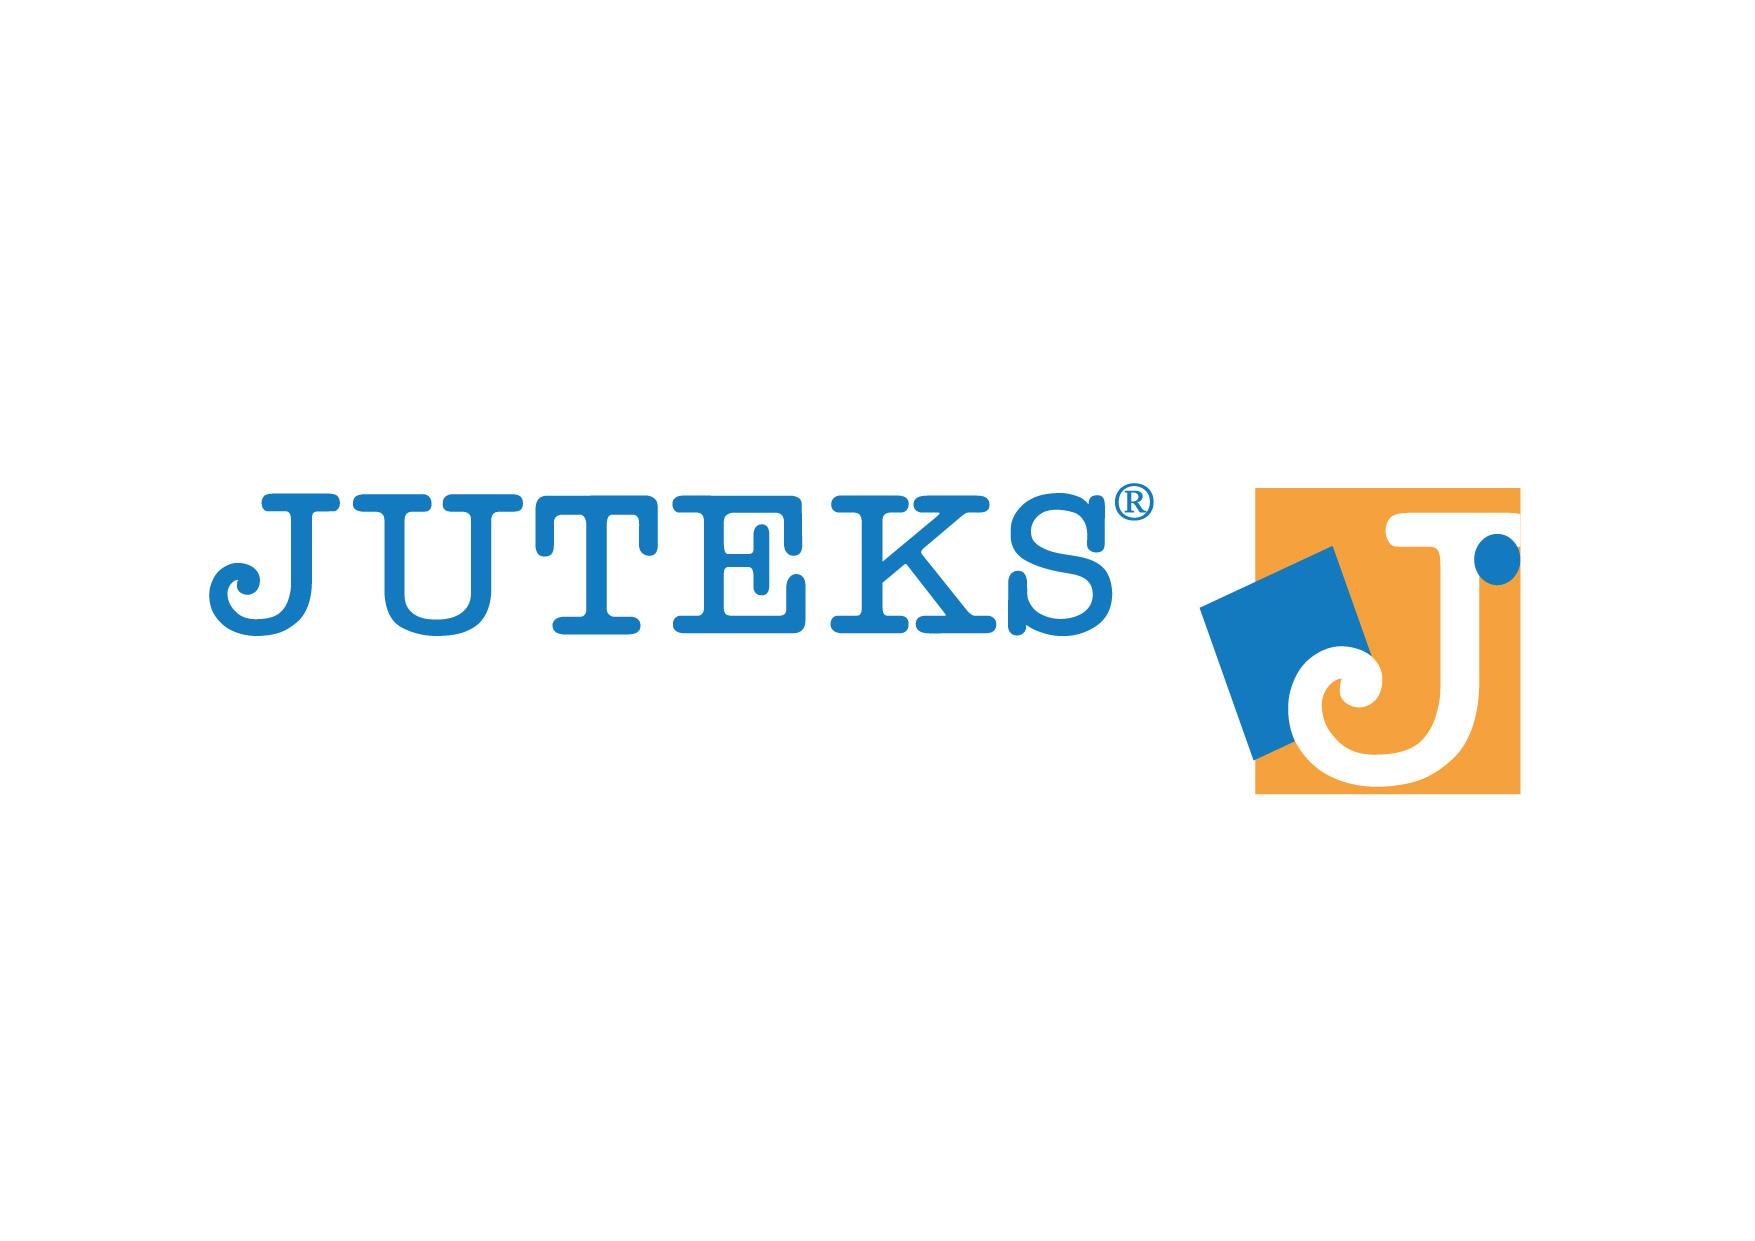 https://covialsa.com/wp-content/uploads/2019/12/logos_marca_covialsa_juteks.jpg